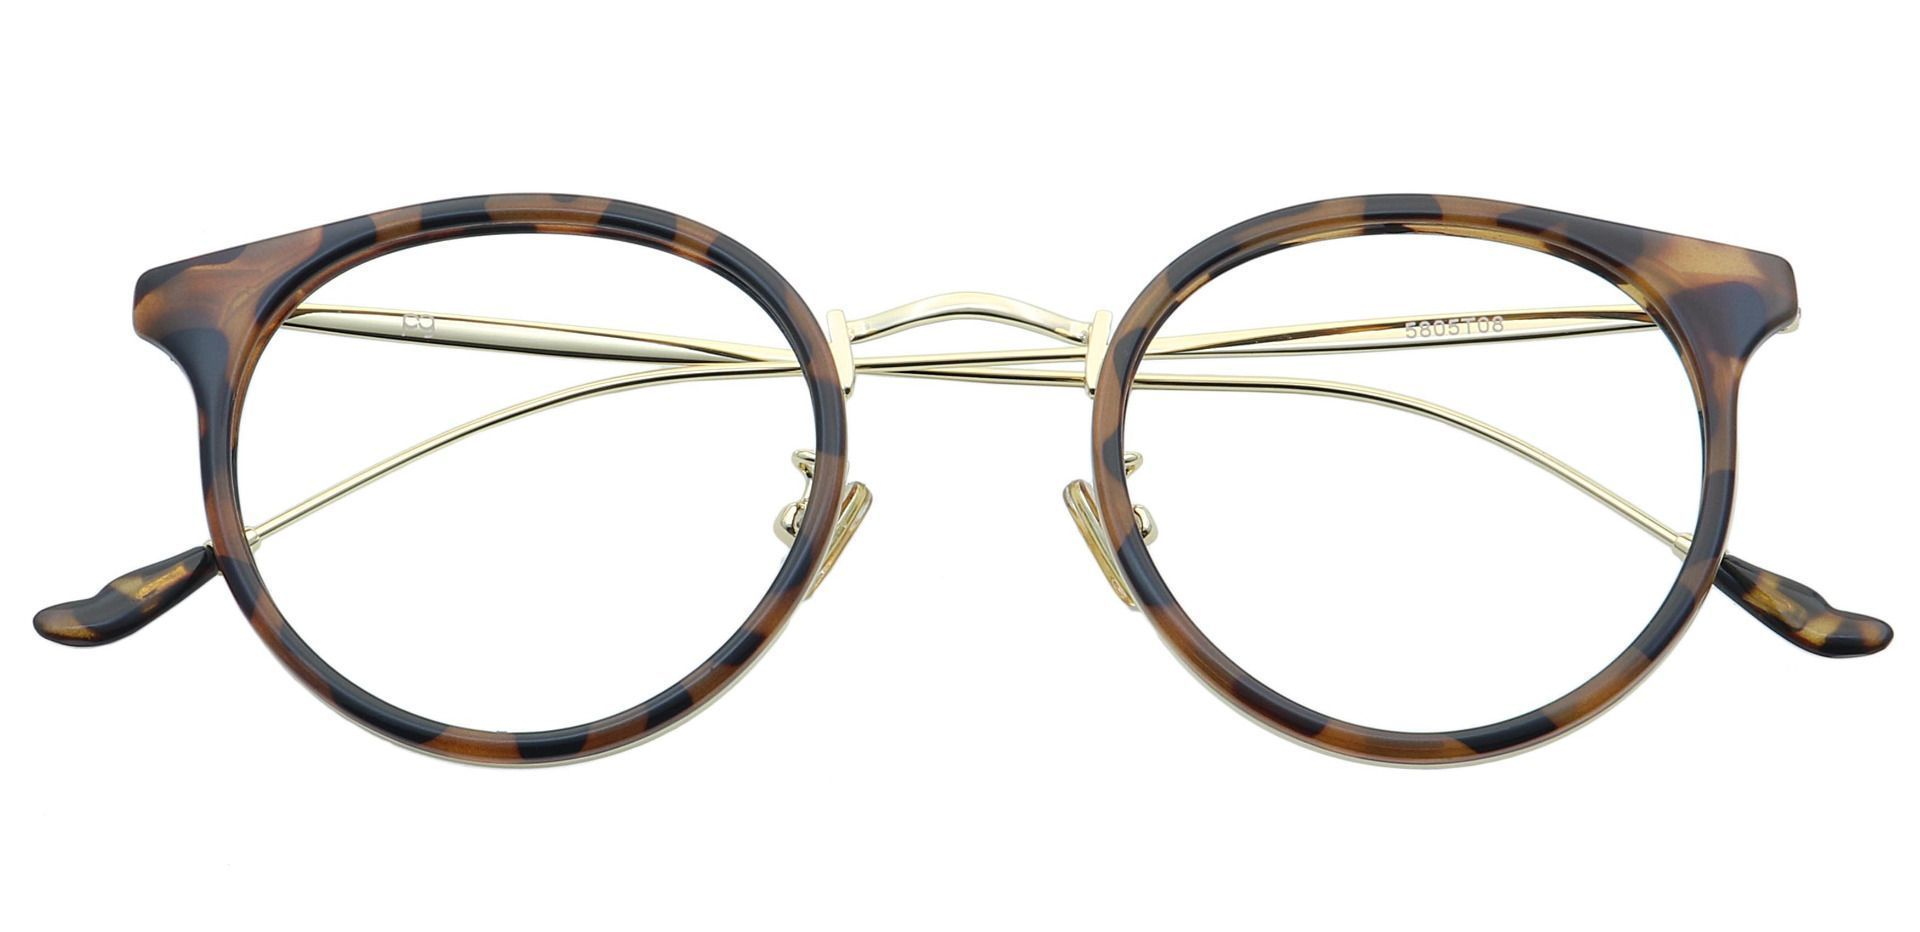 Schenley Round Prescription Glasses - Tortoise